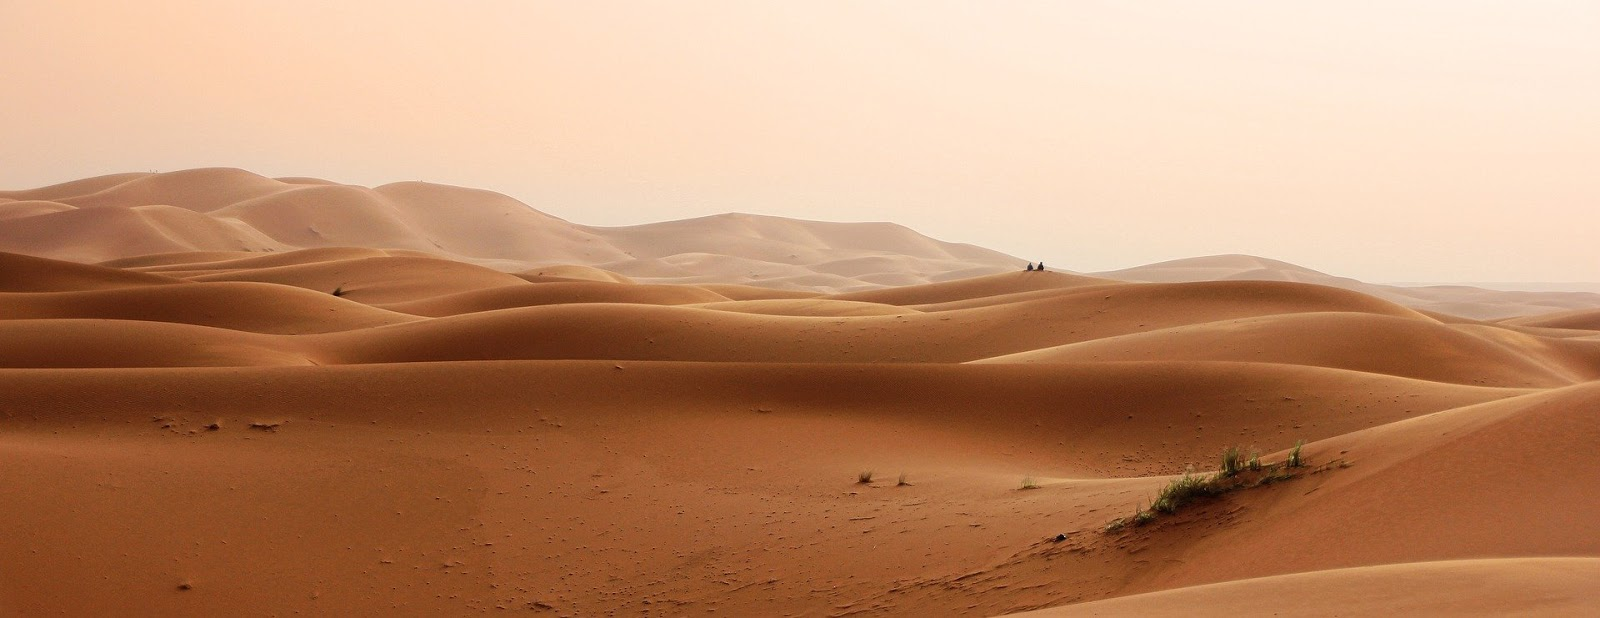 morocco desert with dunes